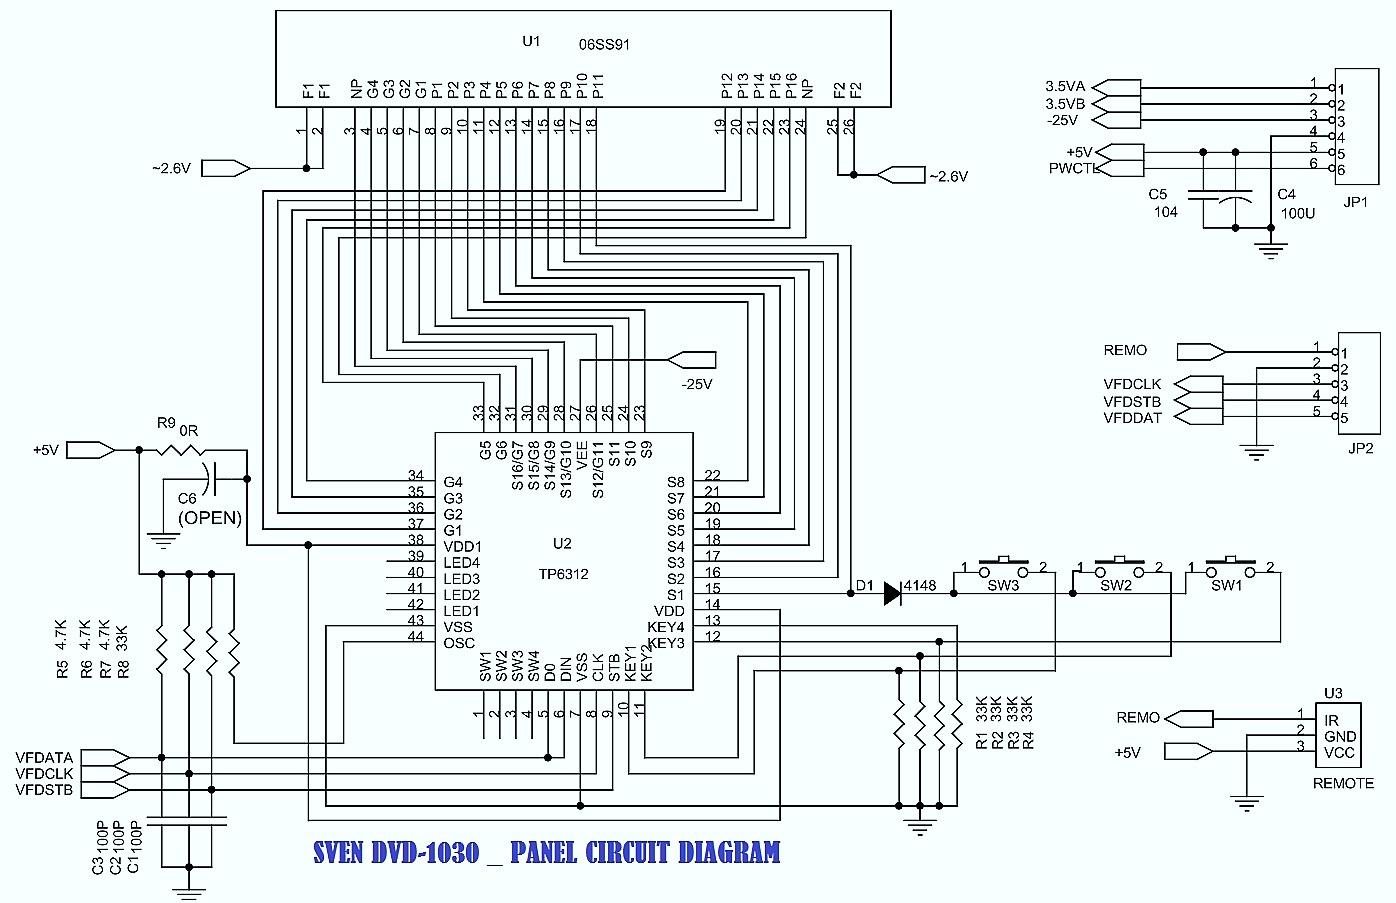 medium resolution of hyundai veloster wiring diagram circuit diagrams hyundai 2001 hyundai tiburon radio wiring diagram hyundai tiburon radio